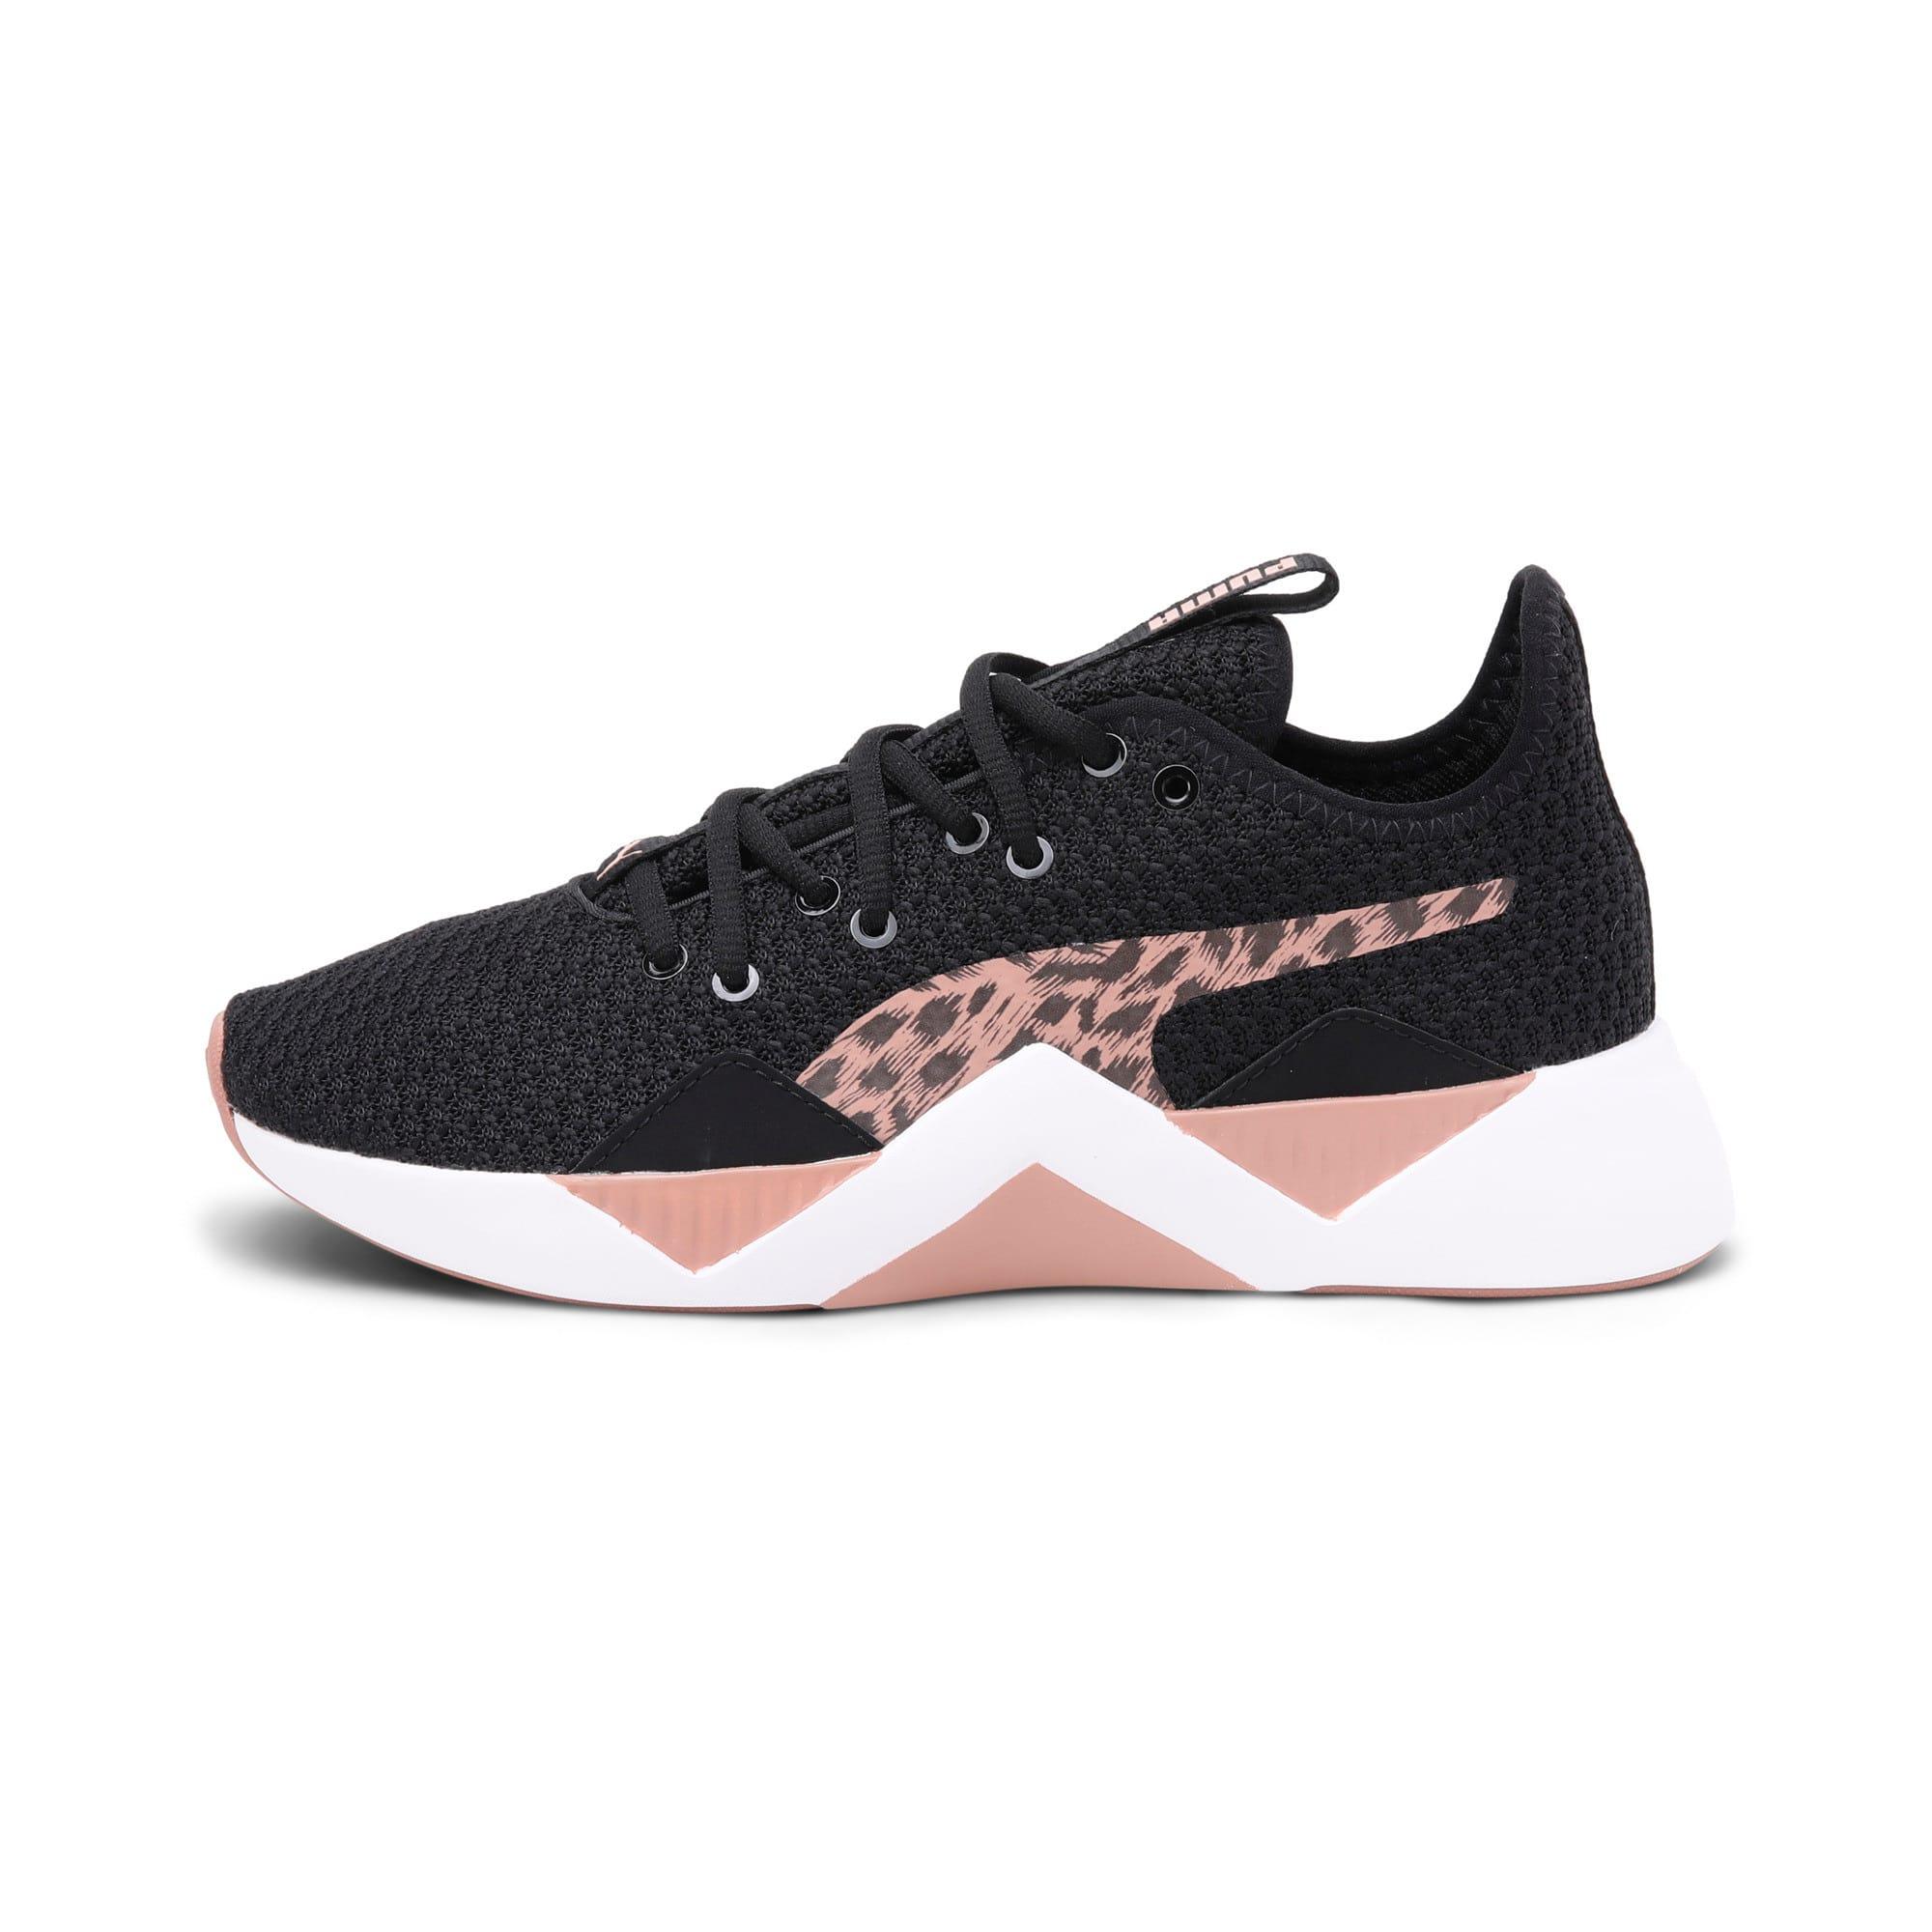 Thumbnail 1 of Incite Leopard Women's Sneakers, Puma Black-Mocha Mousse, medium